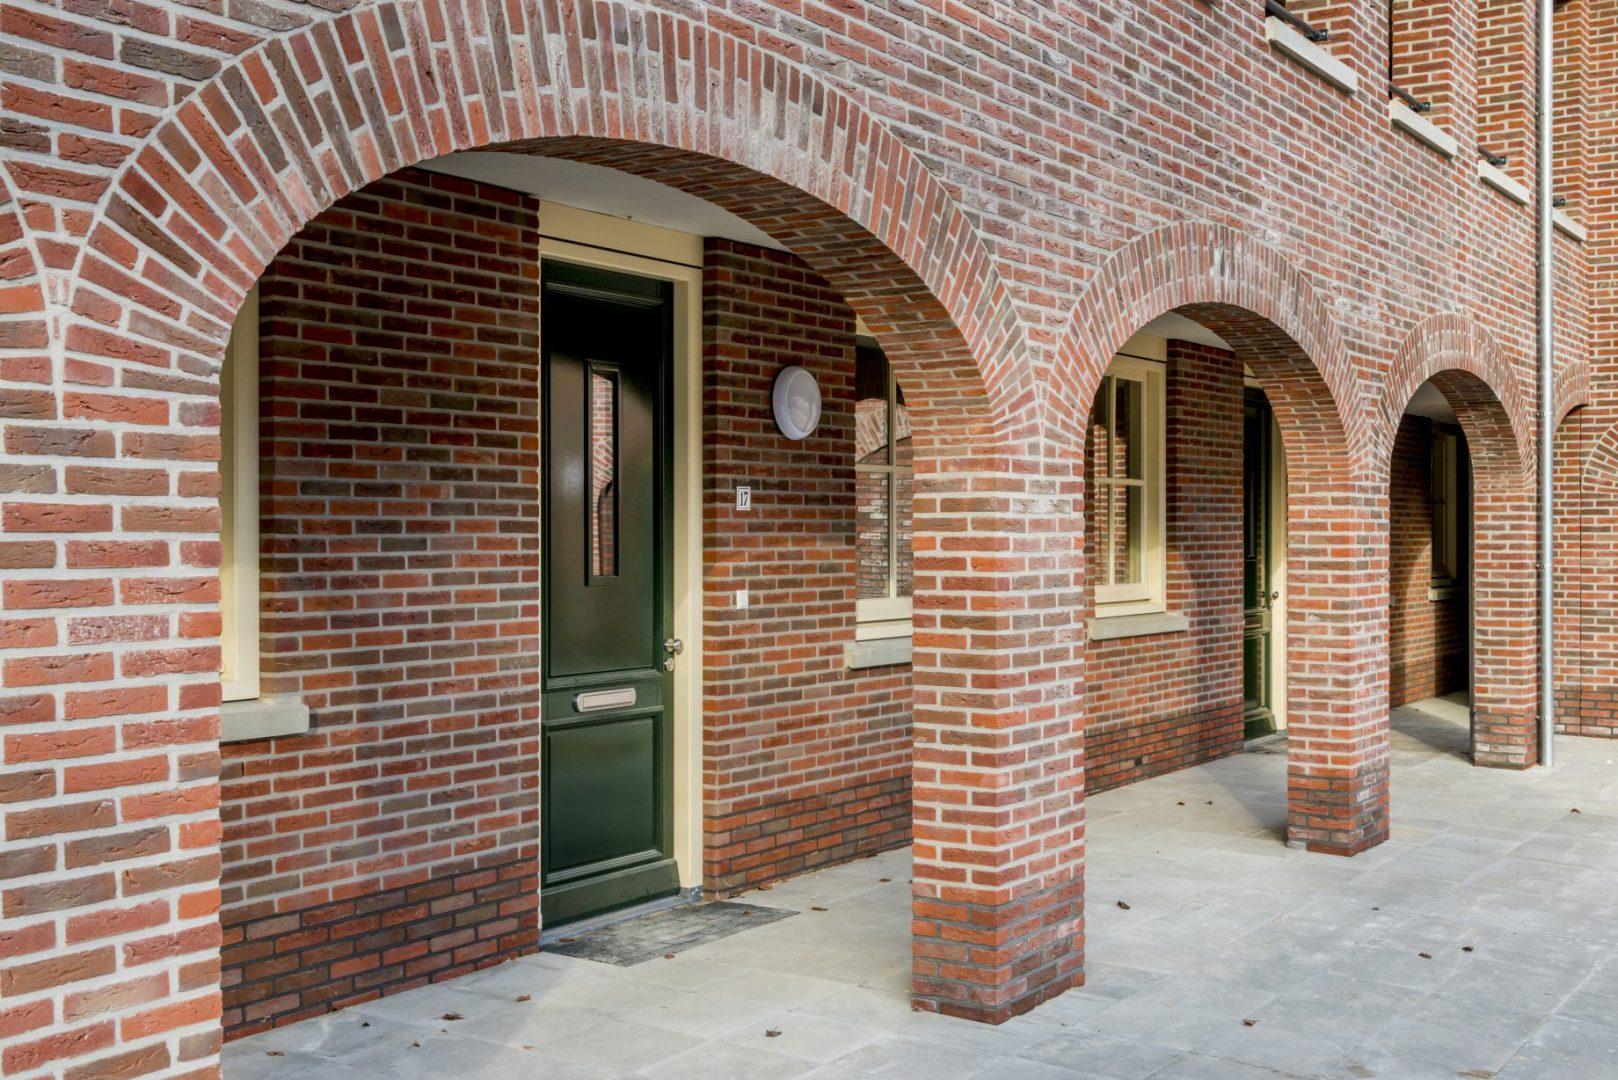 Ringershof-renovatie-ZIJLSTRA-SCHIPPER-architecten-architectenbureau-noord-holland-architect-012